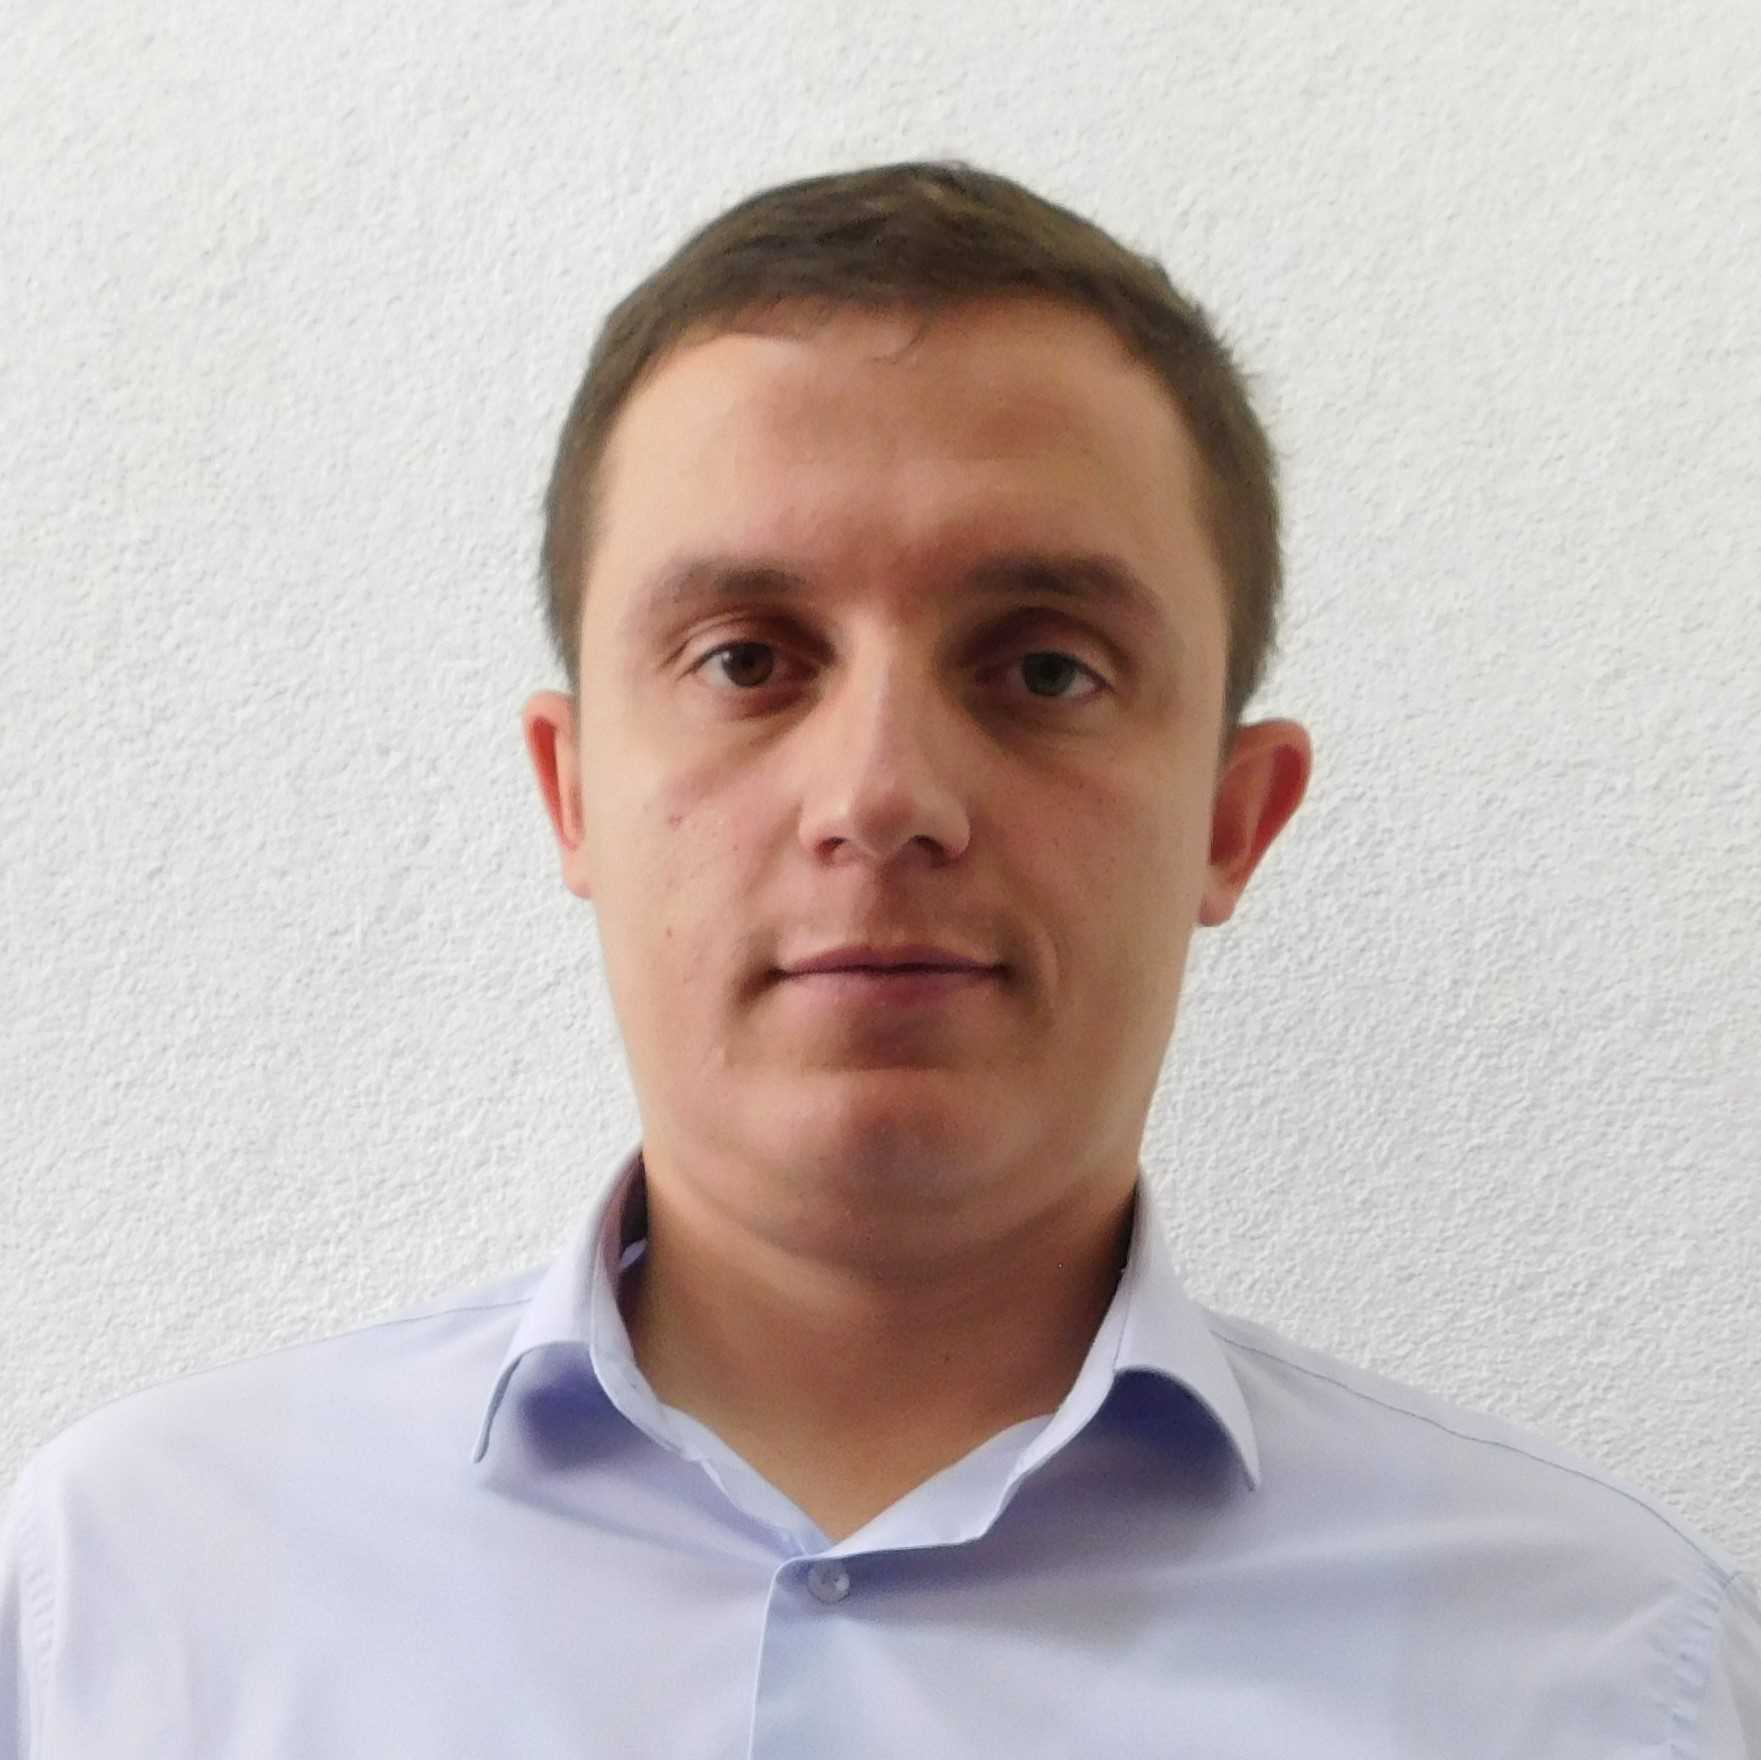 Guxim Kamberi